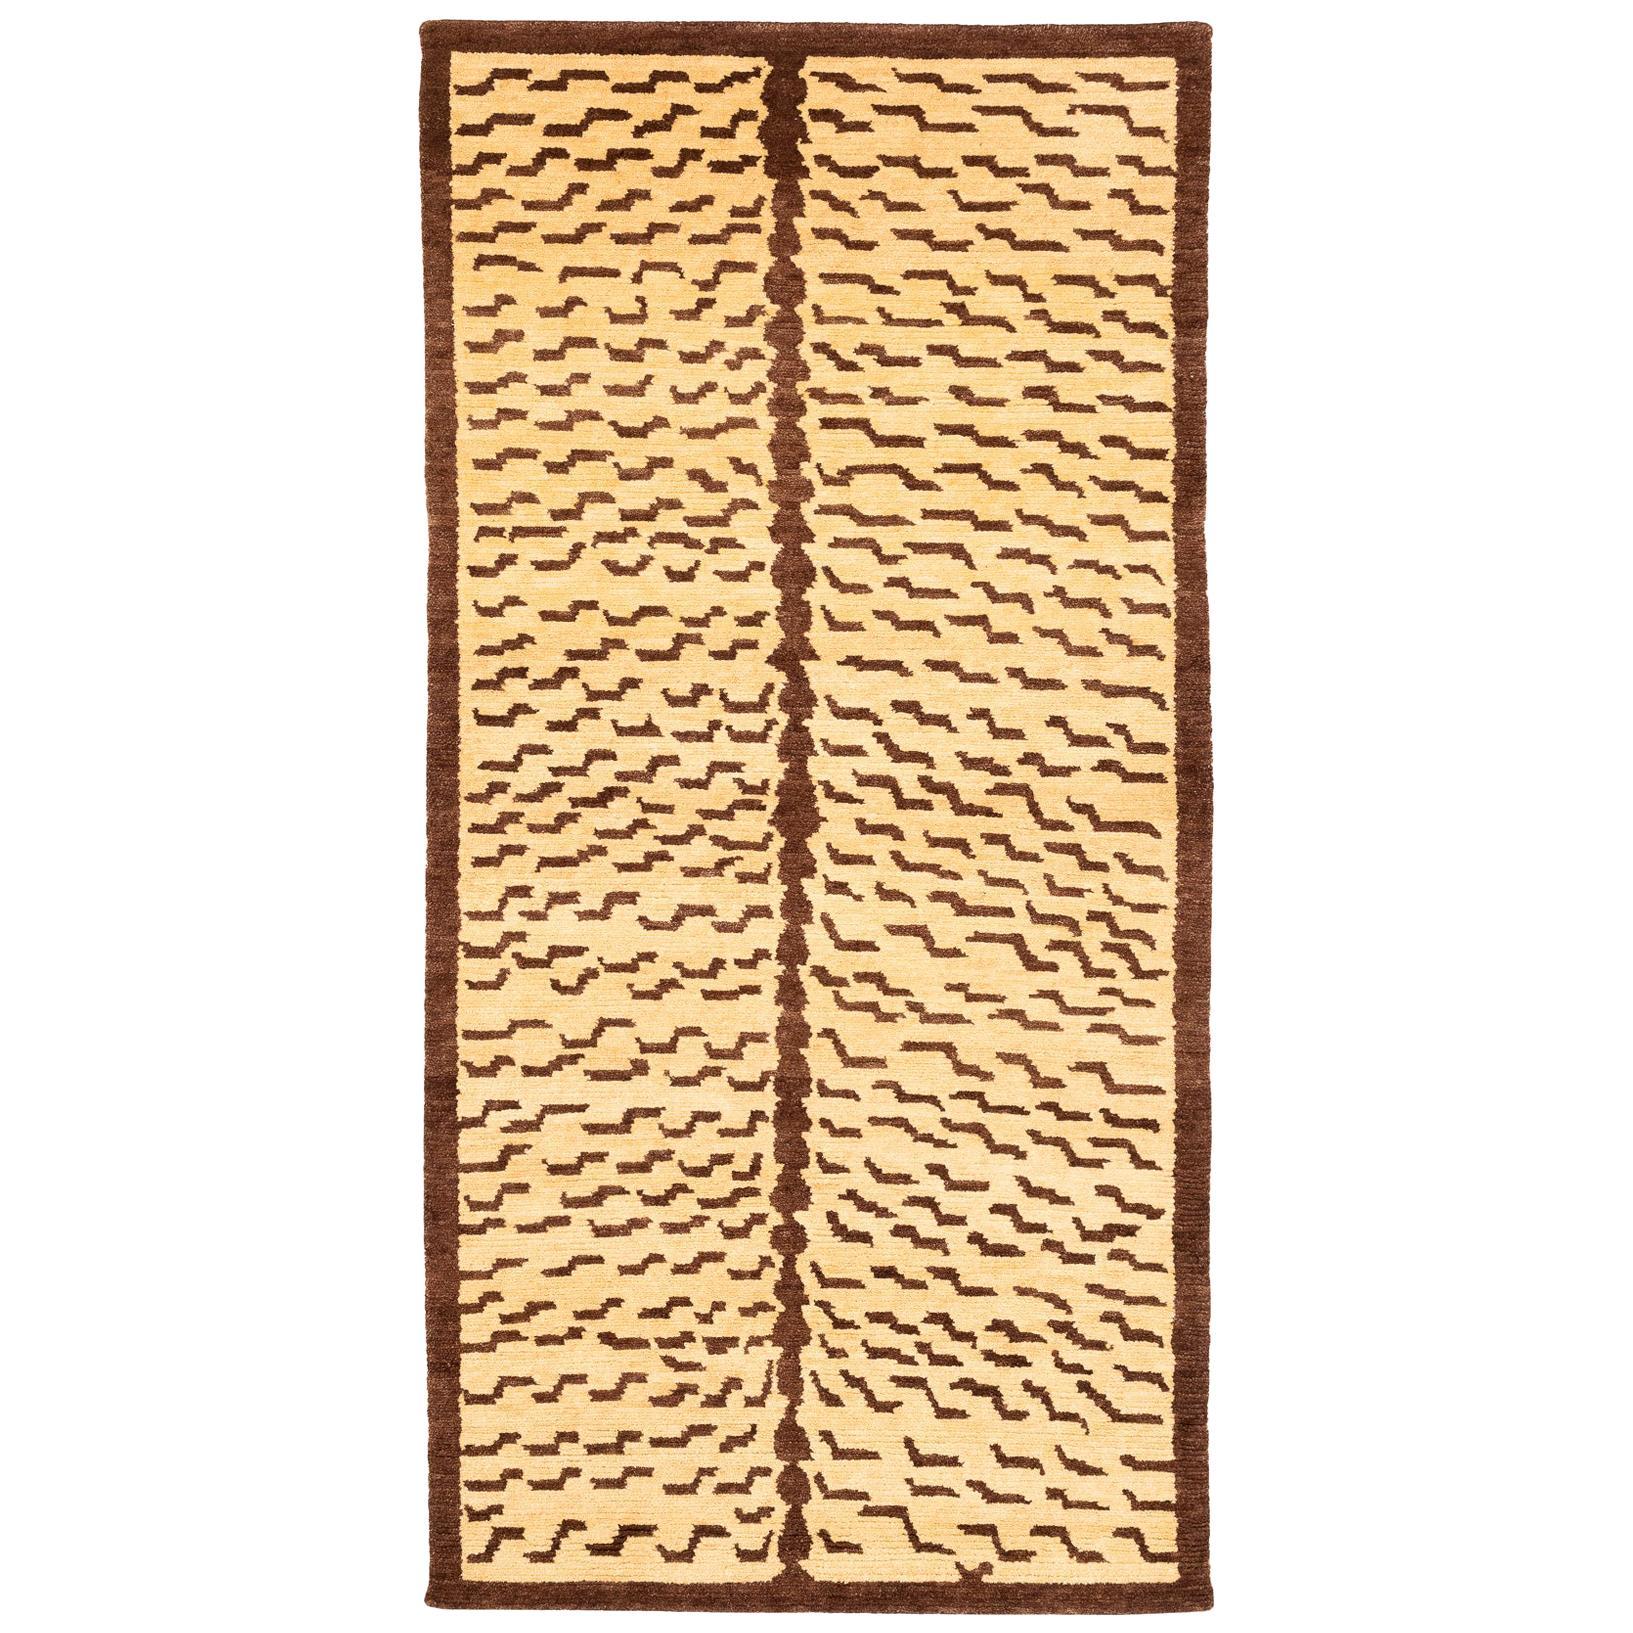 Brown and Tan Wool Tiger Area Rug